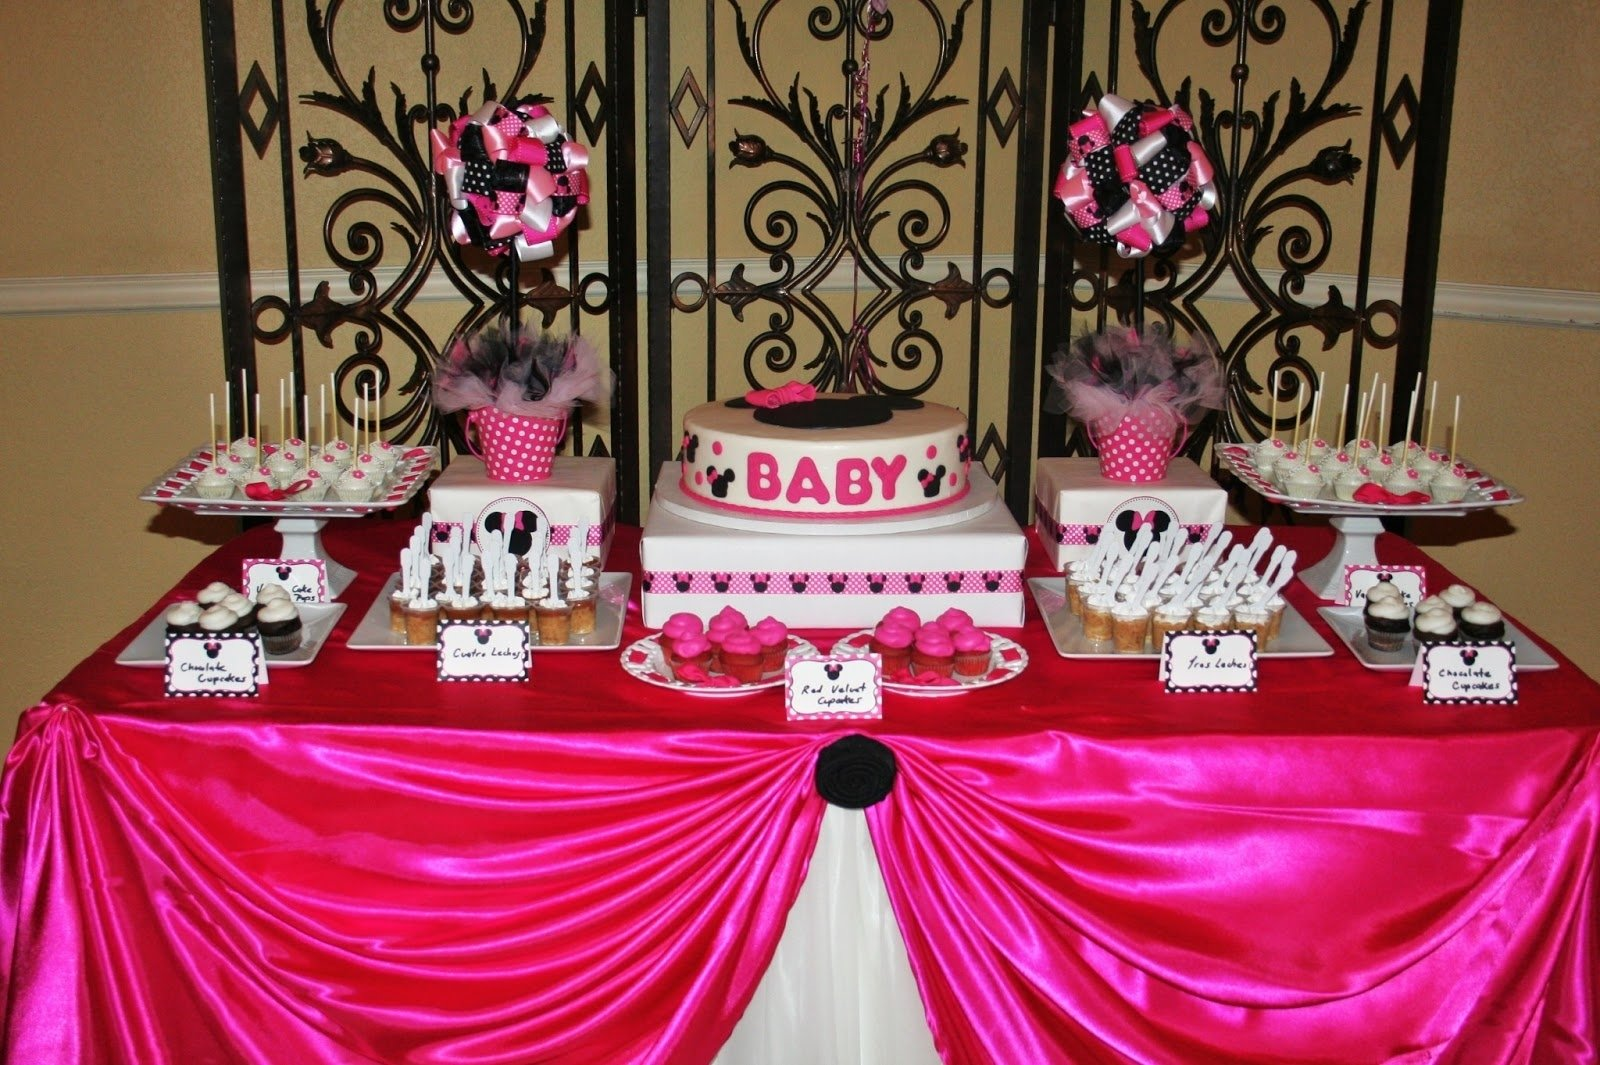 10 Wonderful Baby Minnie Mouse Baby Shower Ideas minnie mouse baby shower decorations baby shower decoration ideas 1